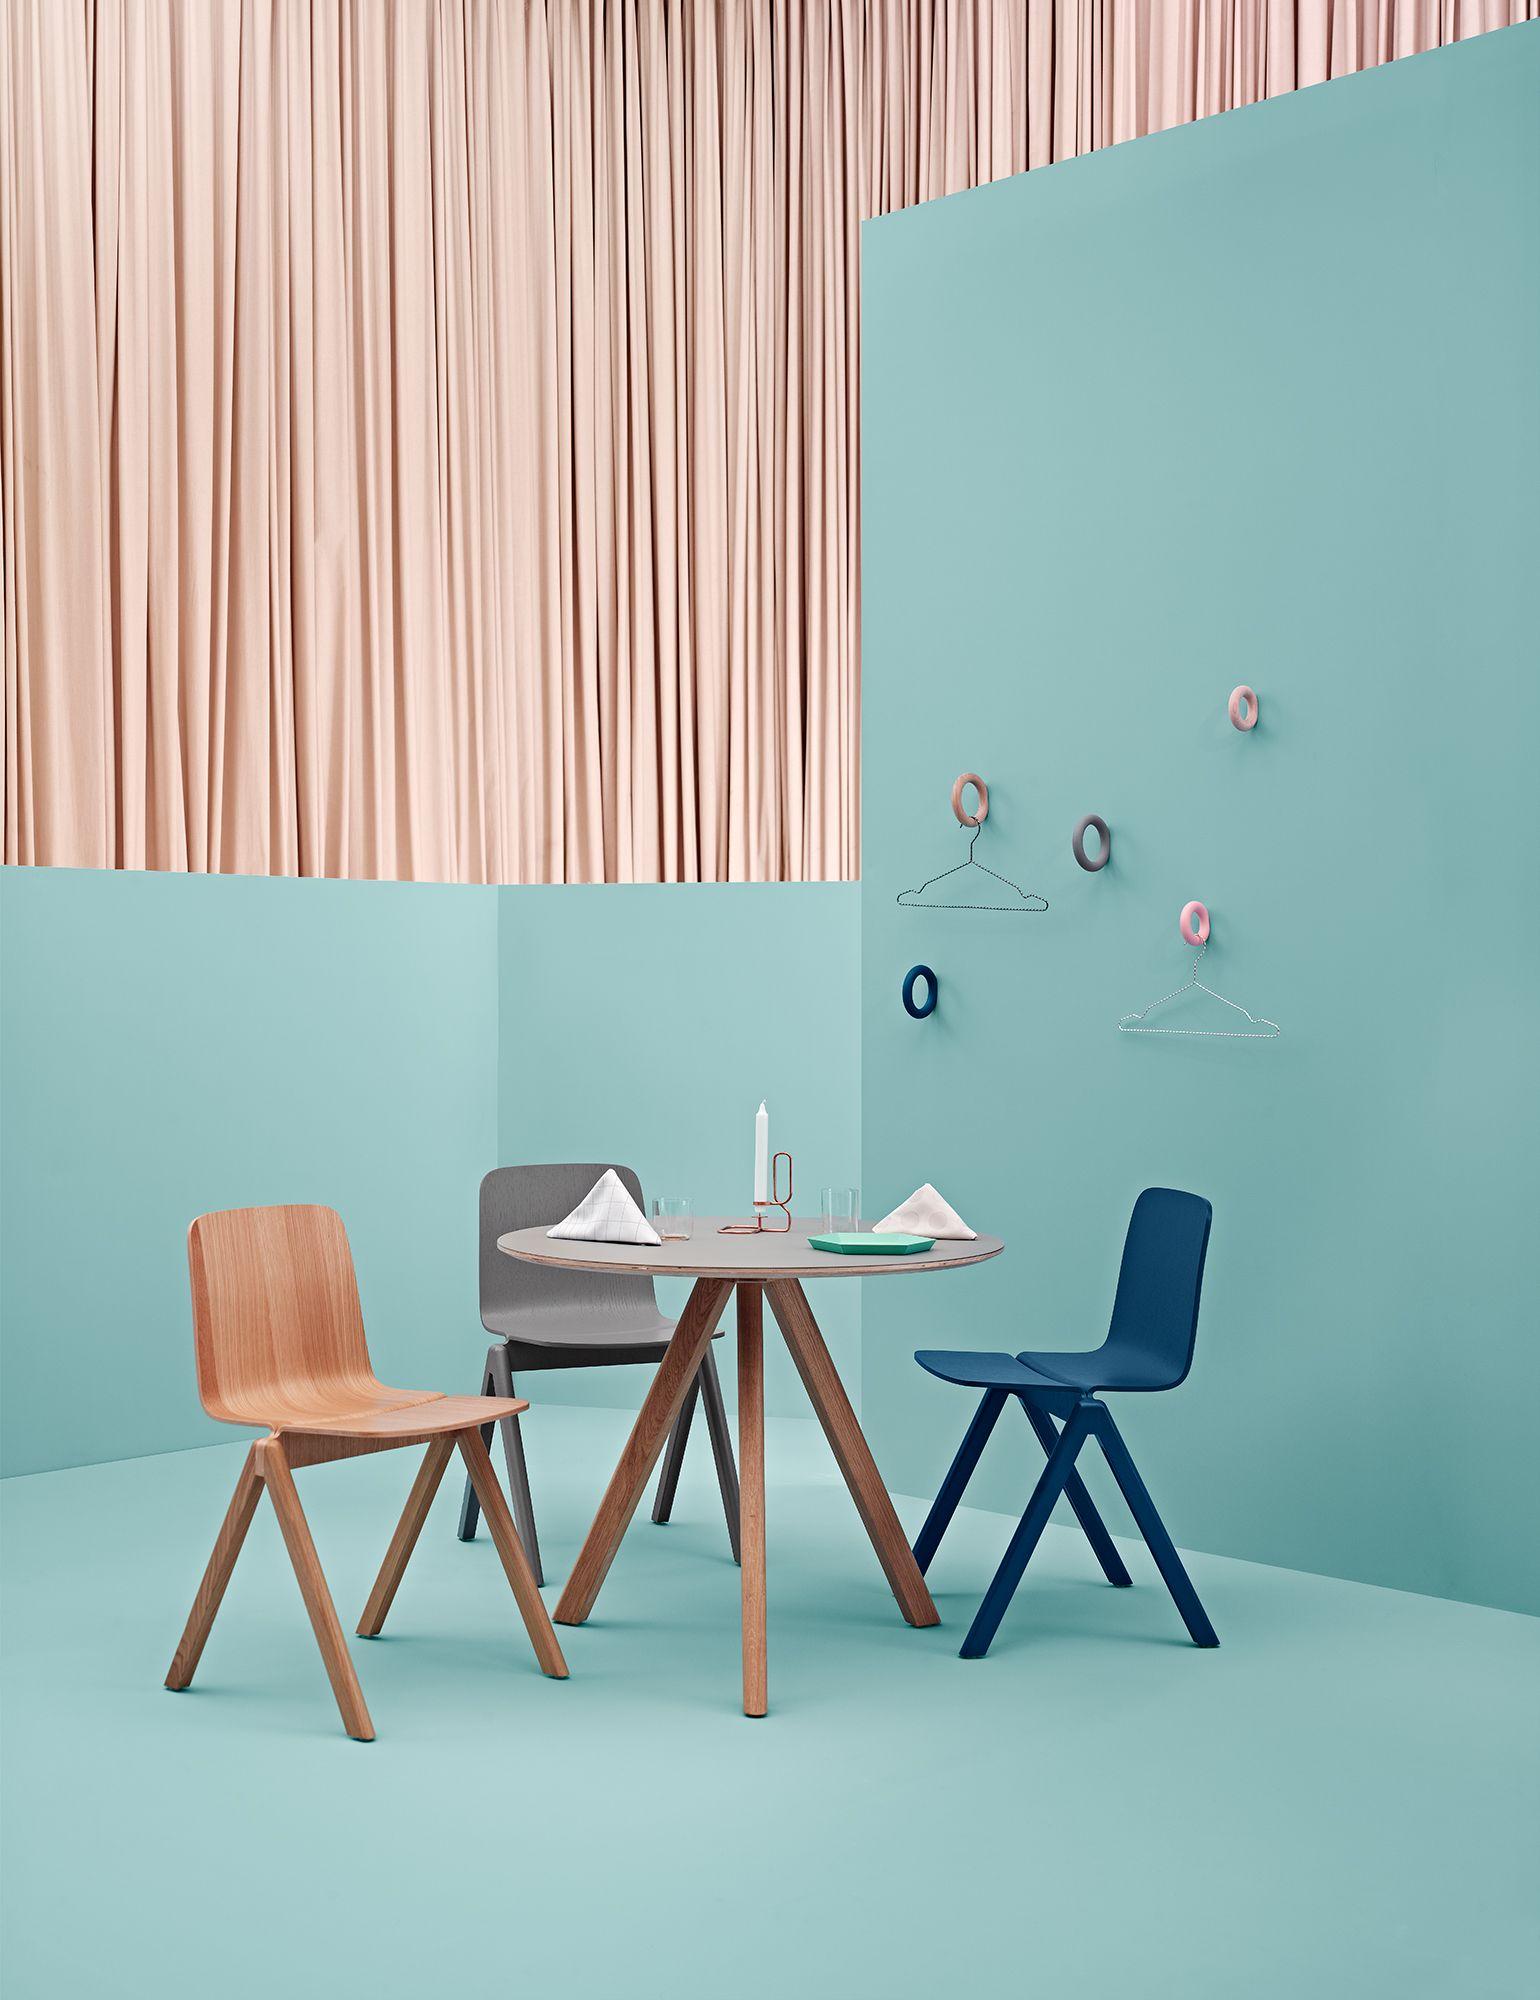 Chaise Copenhagen Bleu Chene Hay Design Home Interior Furniture Assise Siege Decoration Amenage Chaise Design Decoration Elegante Decoration Maison